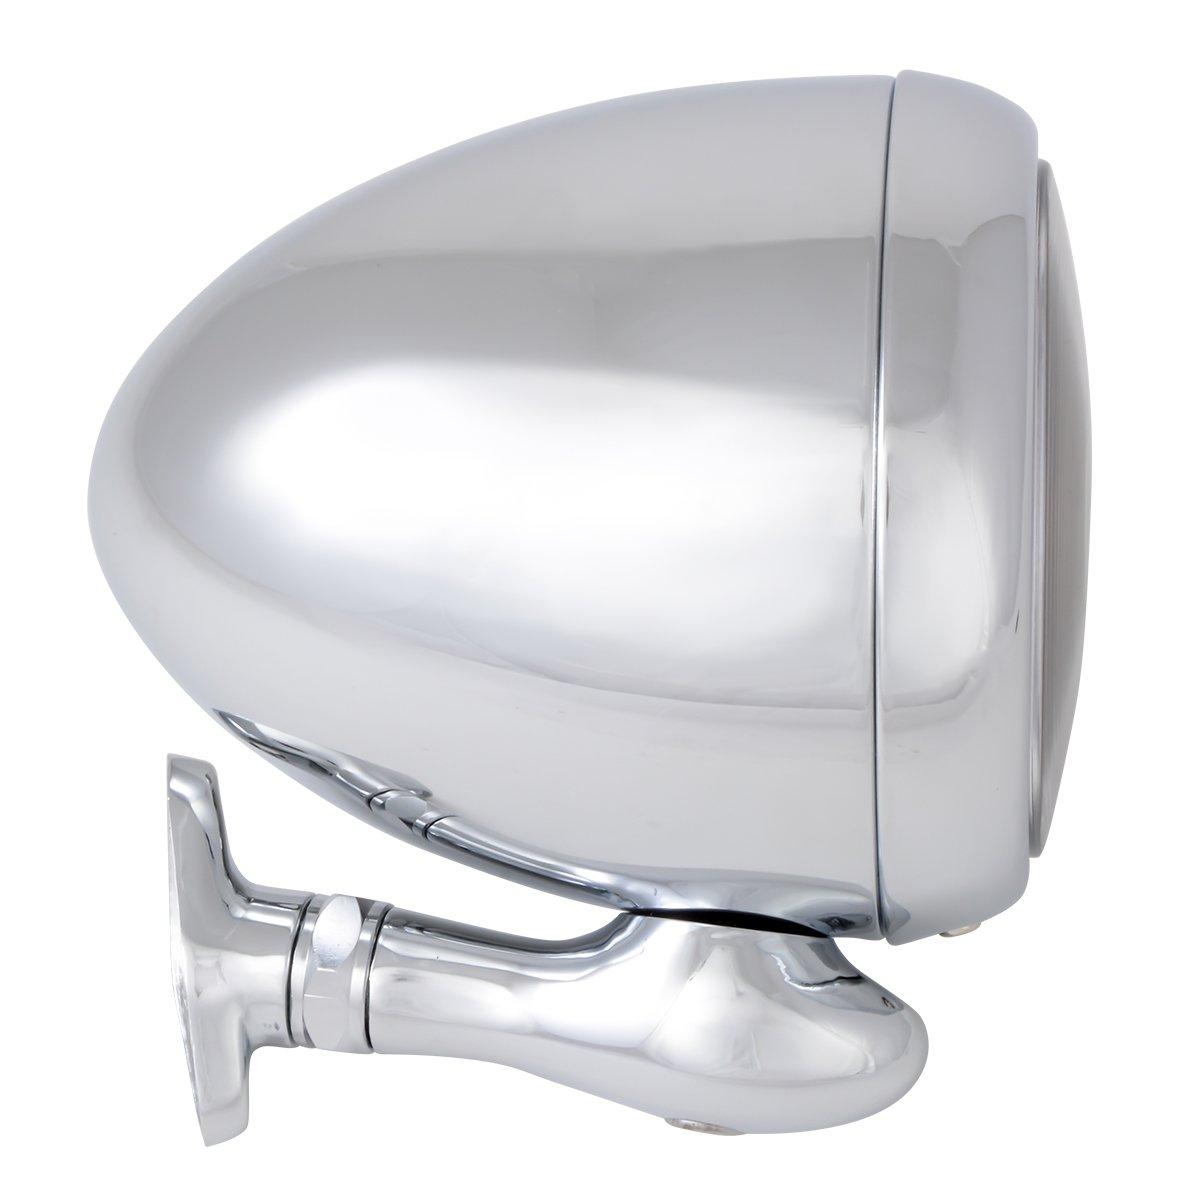 KNS Accessories 8153 Chrome 5 Diameter Teardrop Dummy Spot Light with Clear Plastic Lens